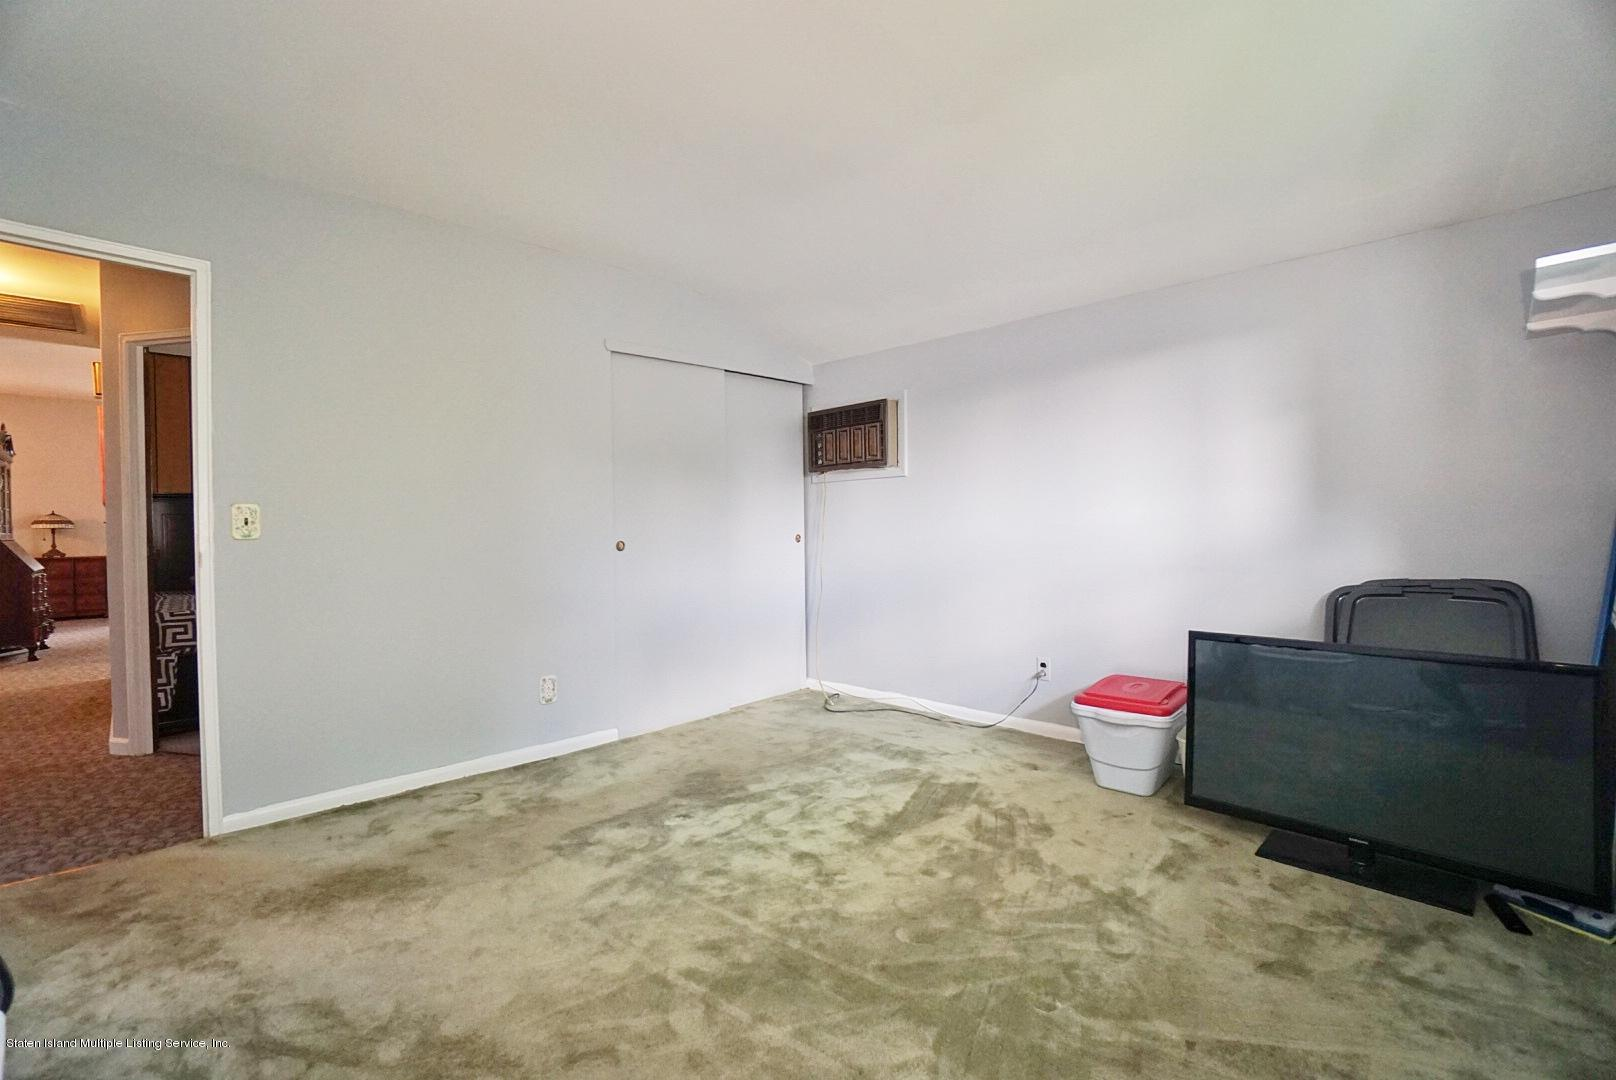 Two Family - Detached 20 Thurston Street  Staten Island, NY 10314, MLS-1131094-29